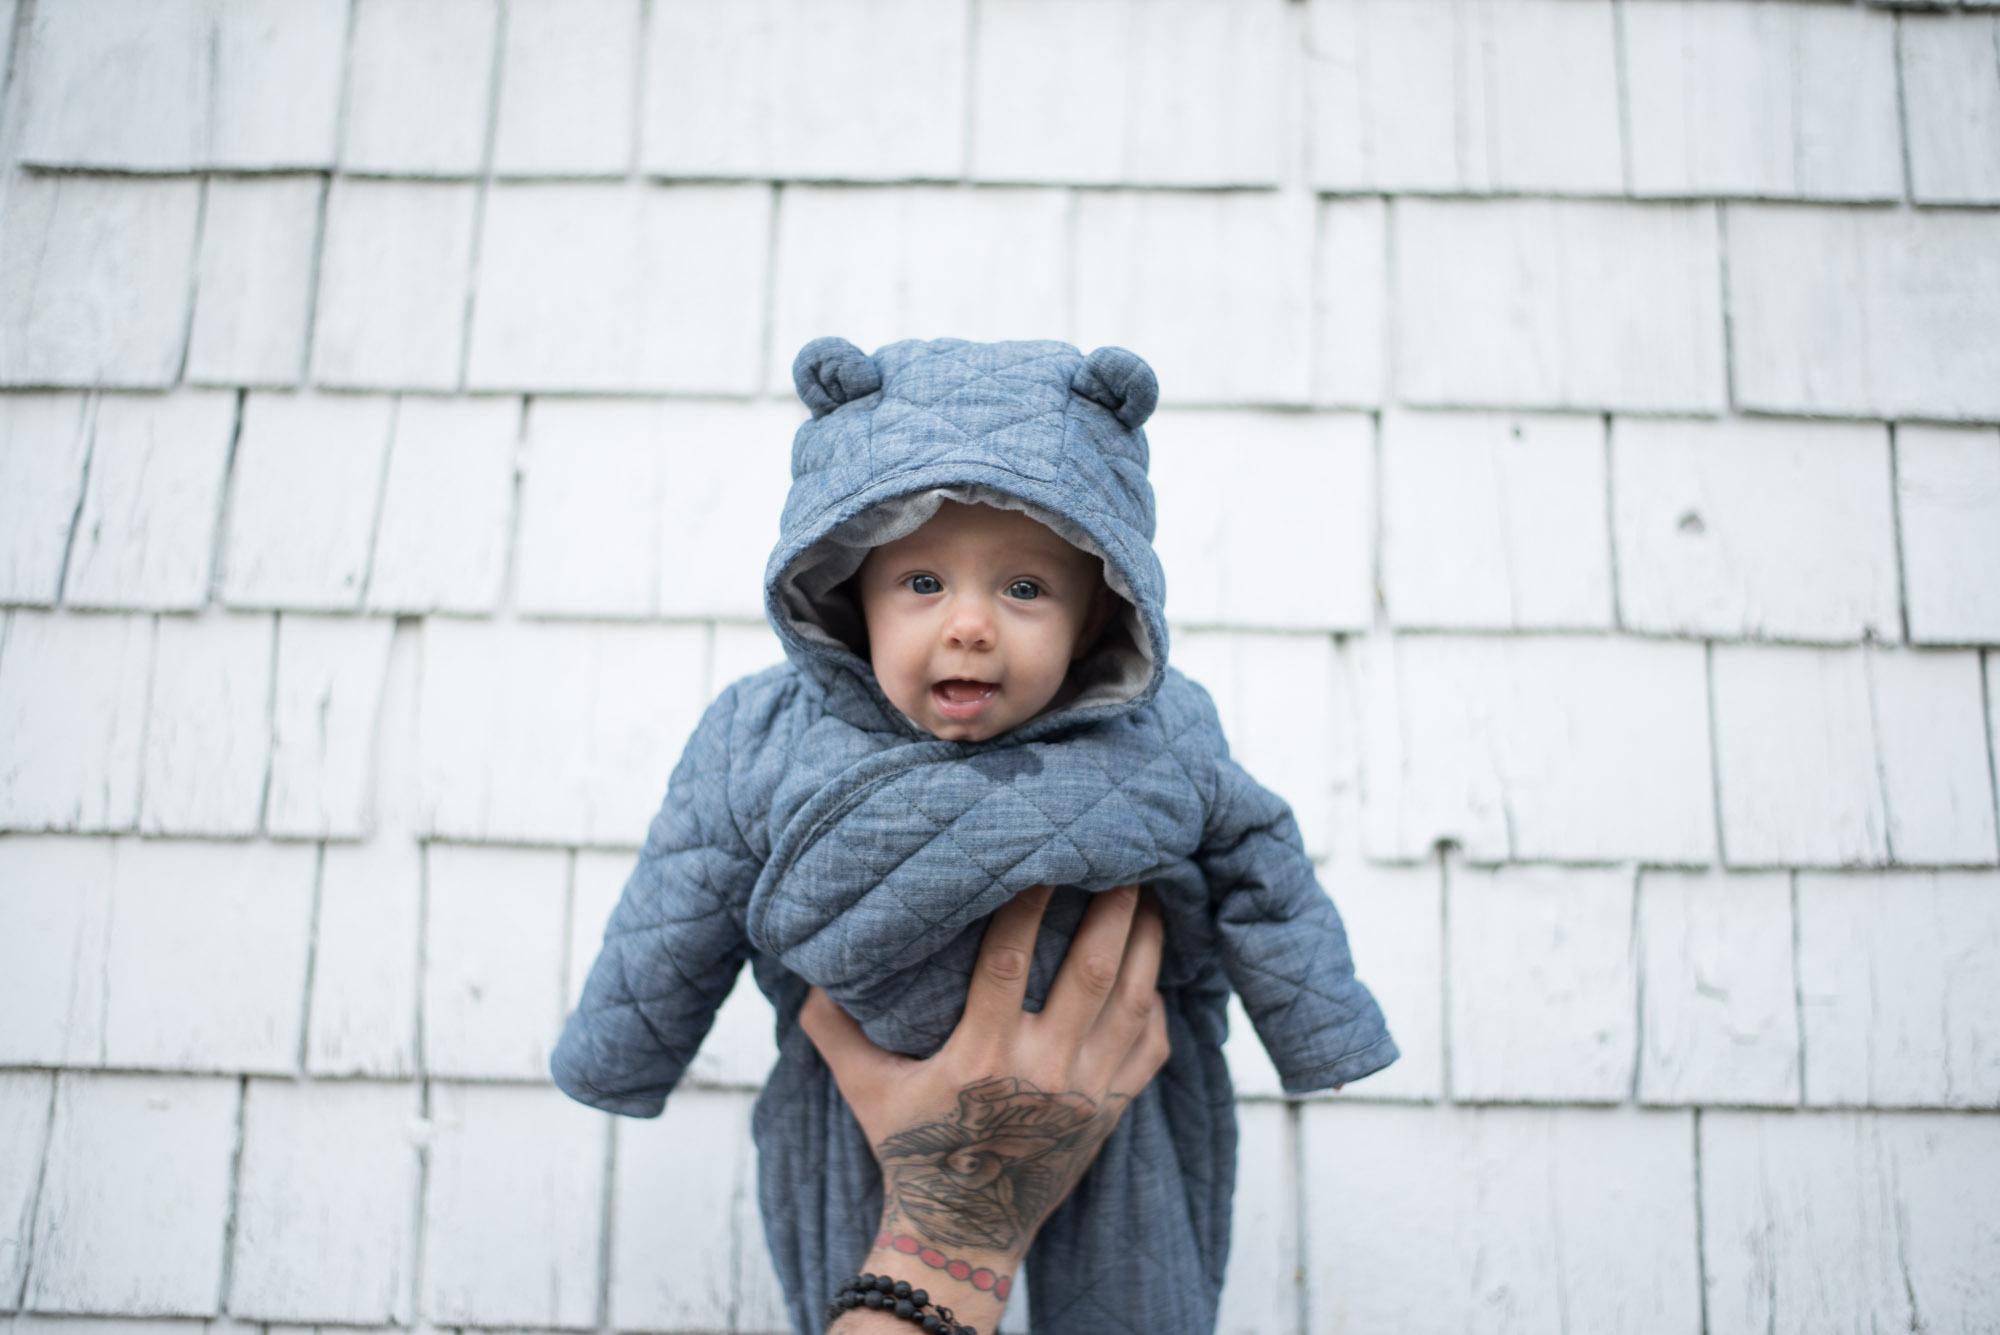 Wild Rosebuds sharing her story on having two children battle Reflux. Gap Baby Bear Snow Suit